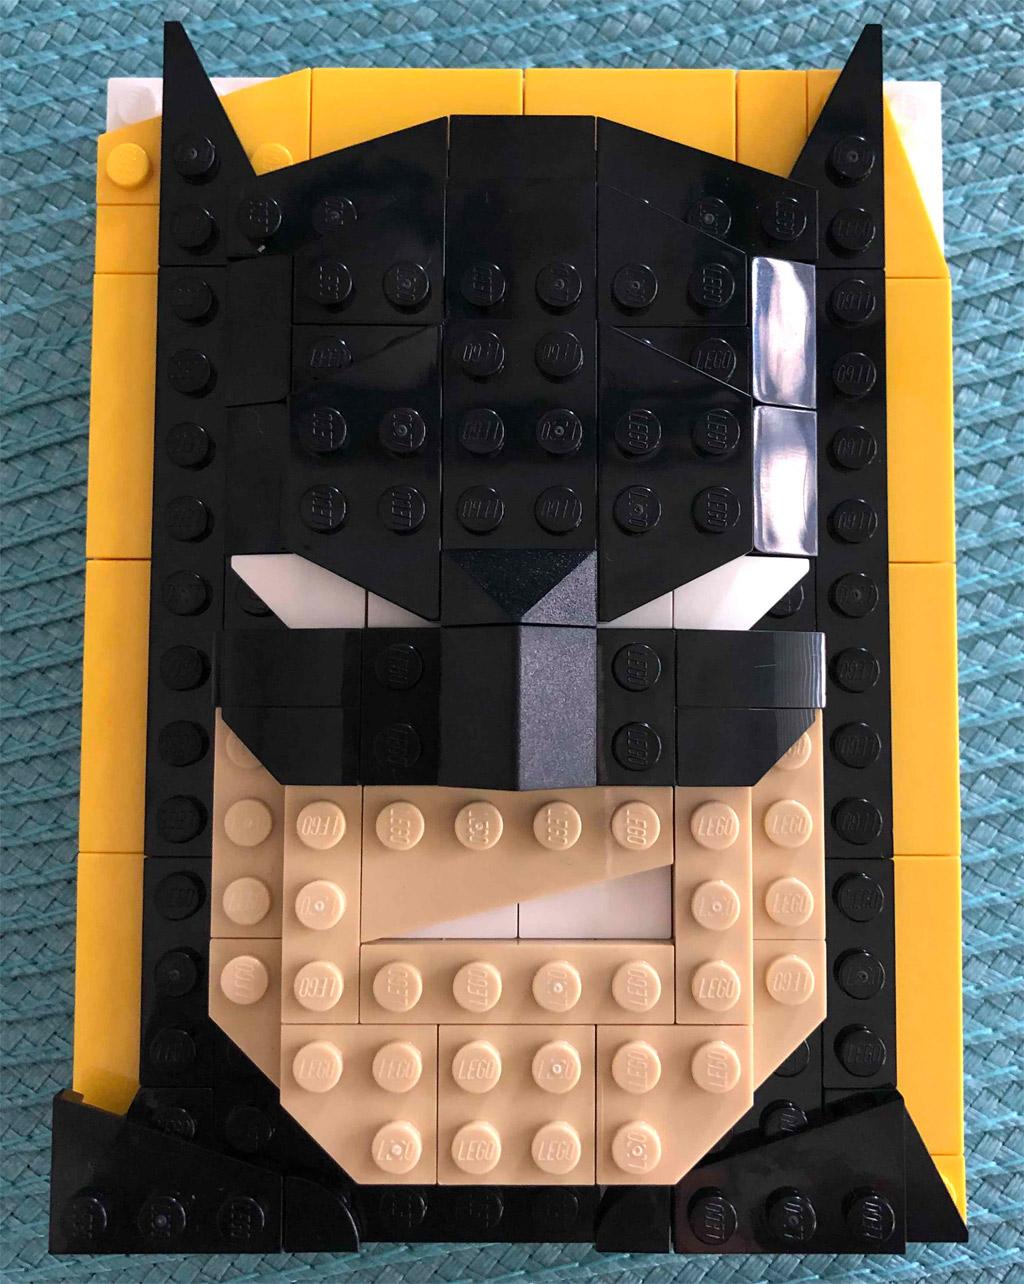 lego-brick-sketches-40386-batman-fertigstellung-2020-zusammengebaut-michael-kopp zusammengebaut.com